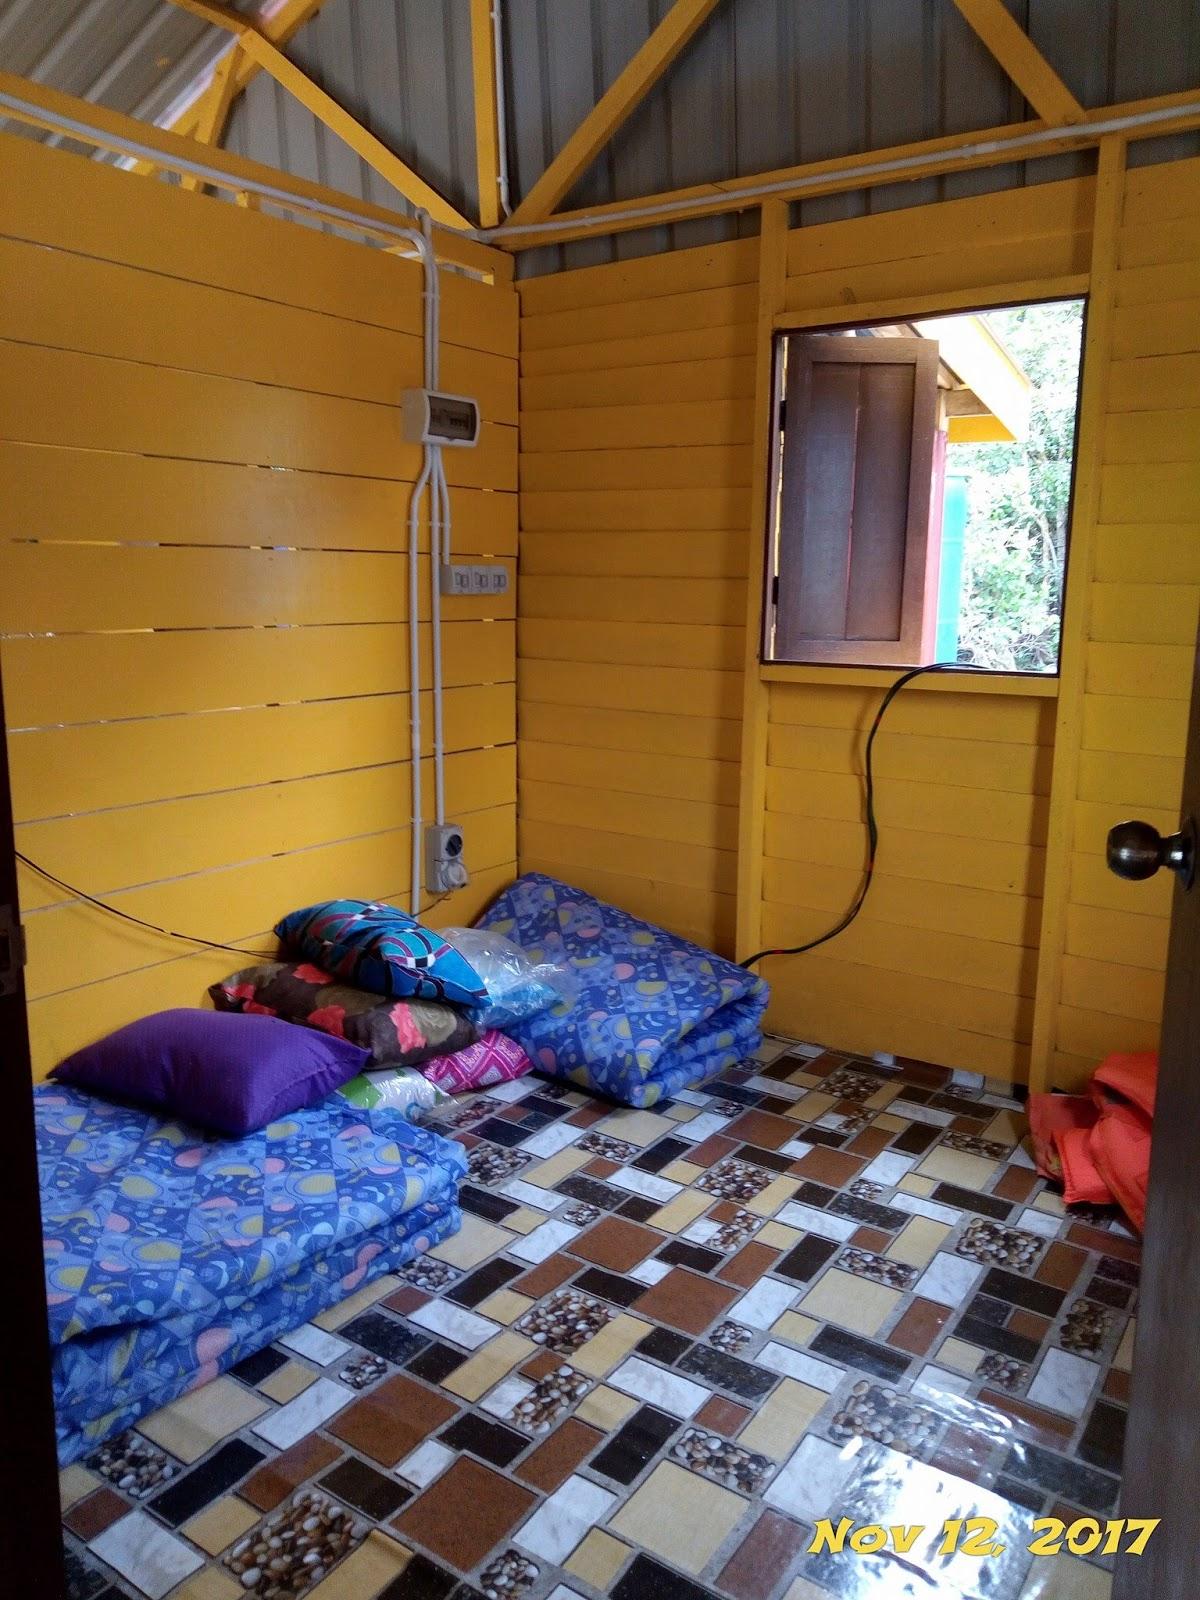 bagi menjamin keselesaan para pengunjung terutama yang datang bersama family Kelengkapan lain seperti tv kipas angin katil juga ada disediakan